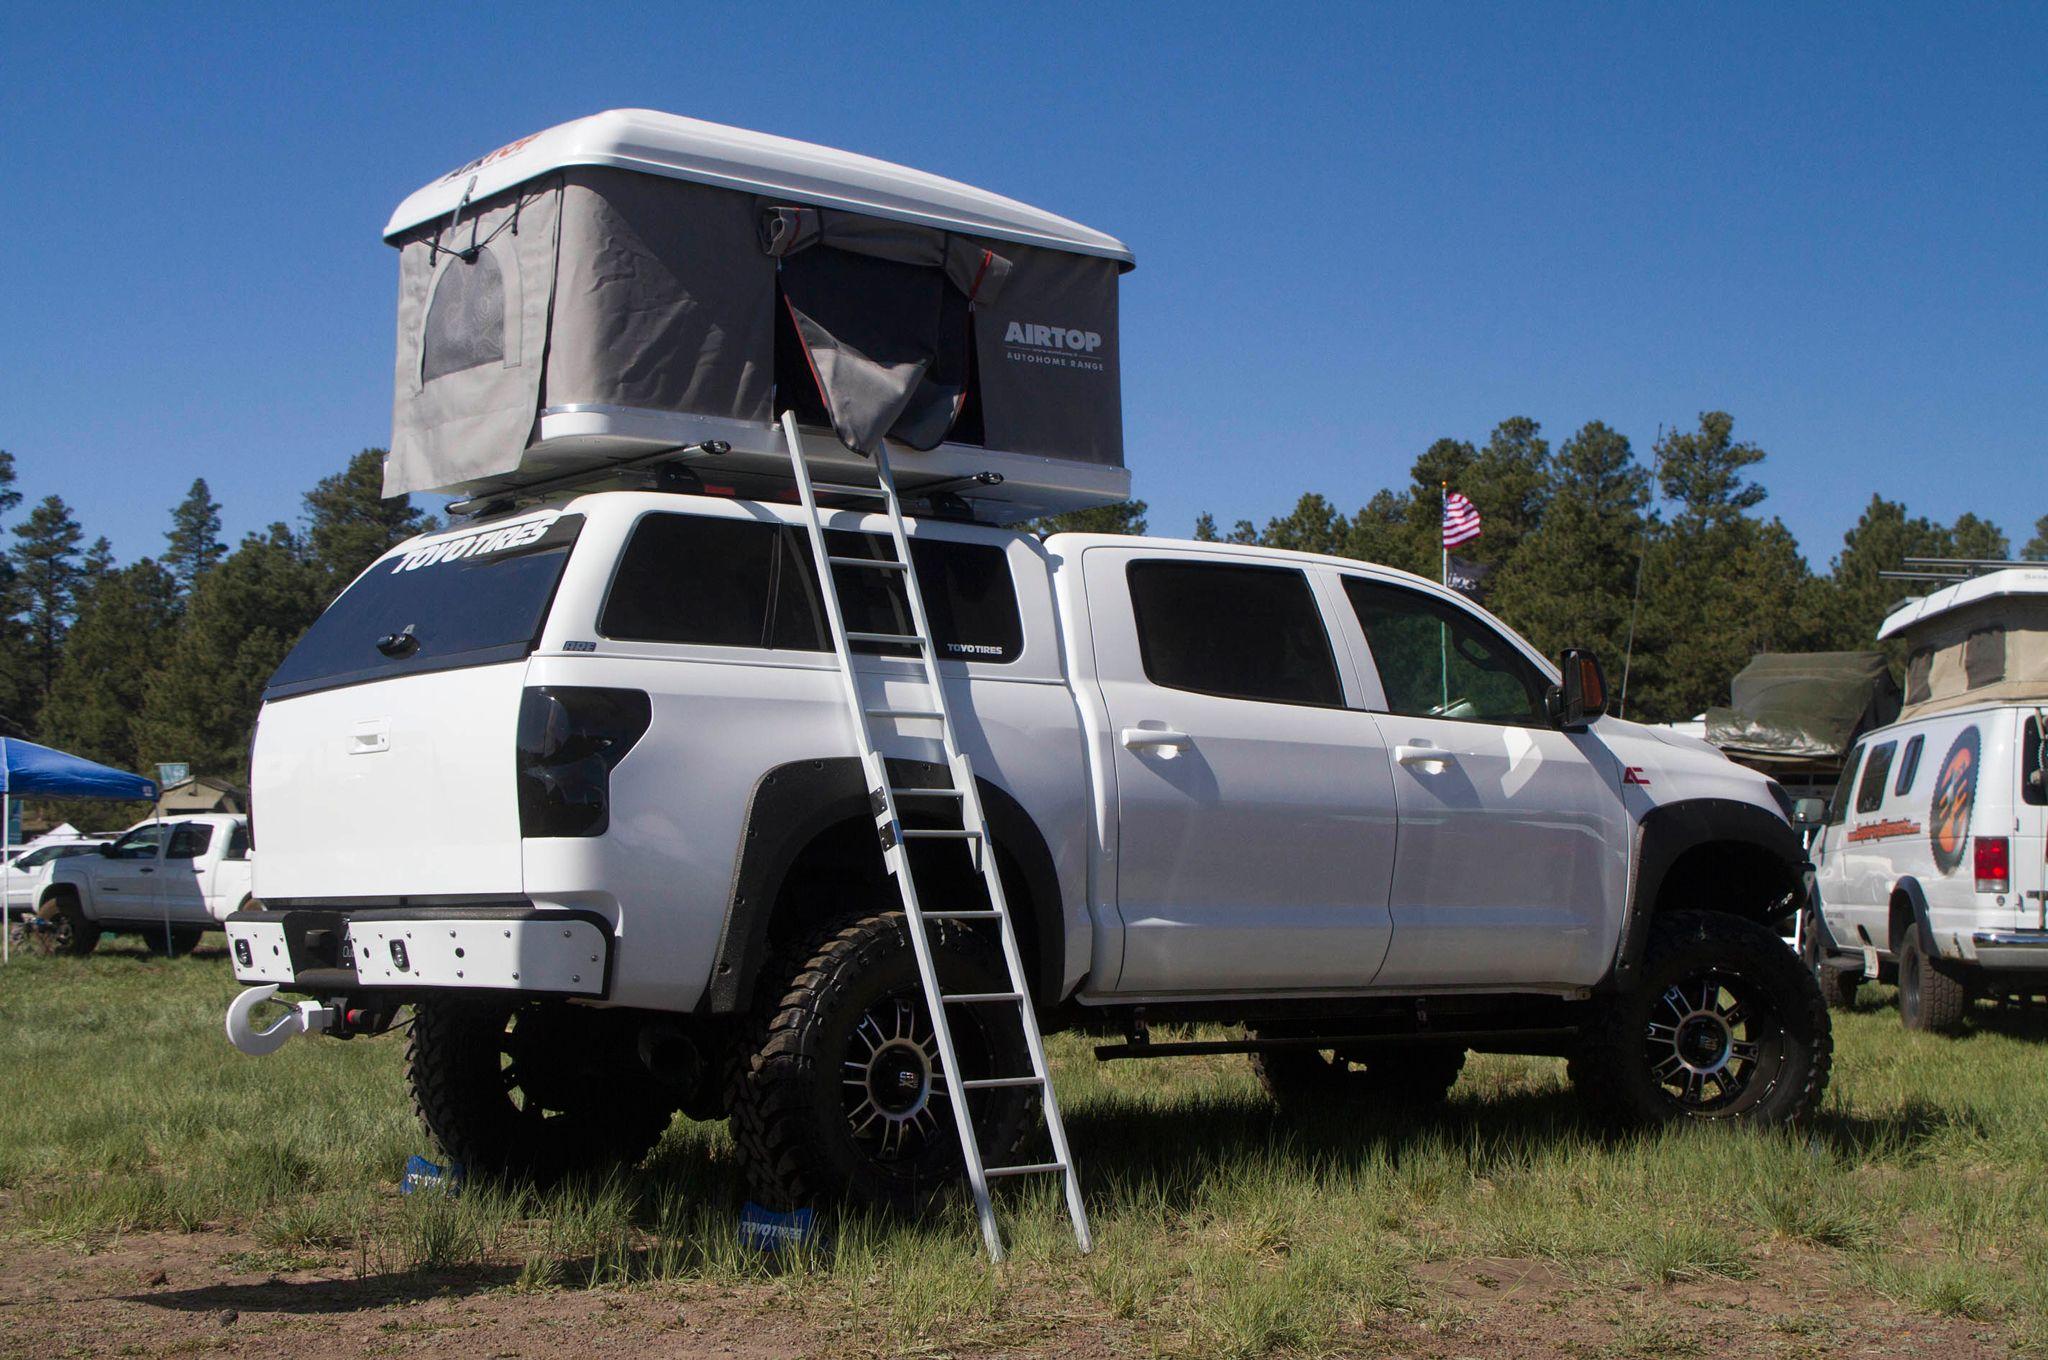 2013 Overland Expo airtop tent & 2013 Overland Expo airtop tent | 4X4 camper | Pinterest ...